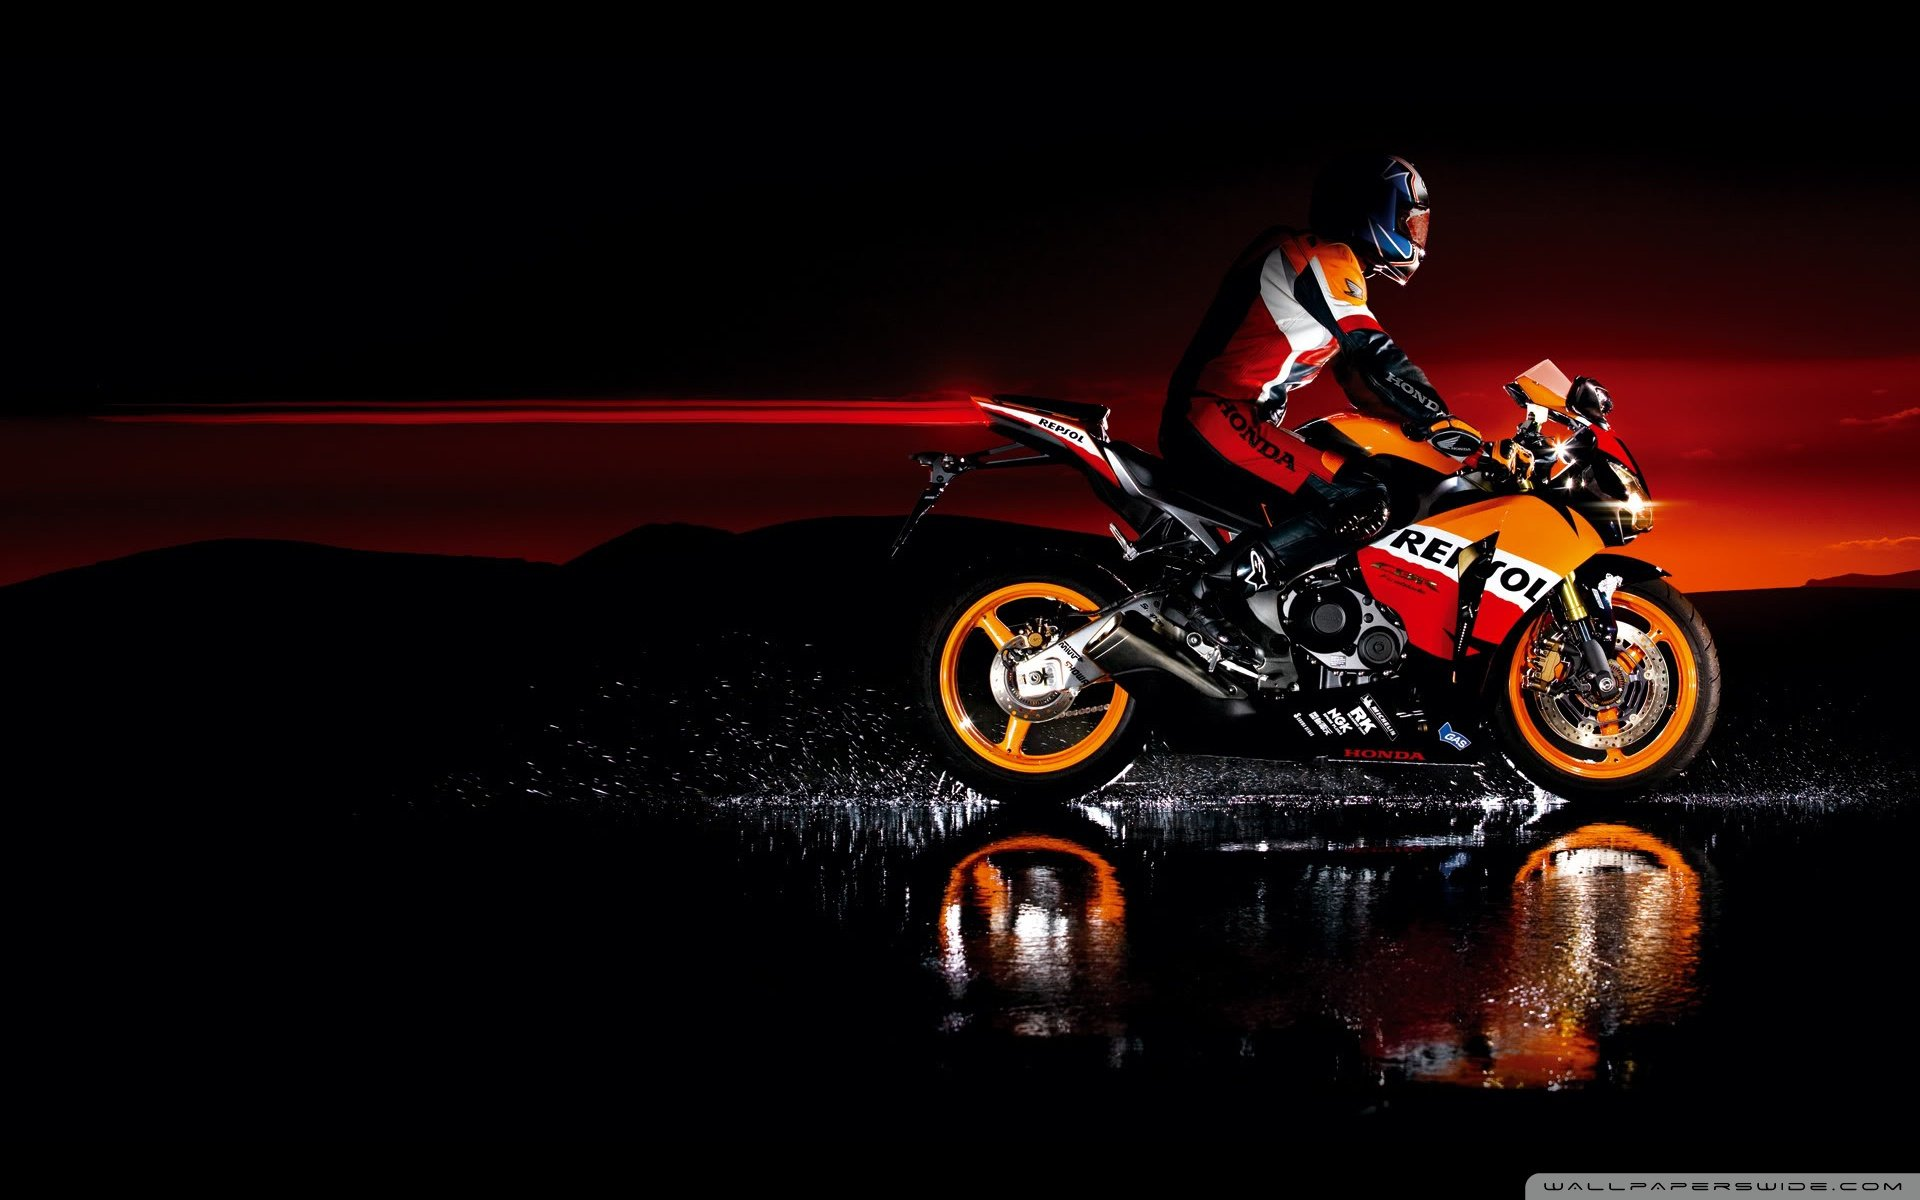 Honda Motorcycle MotoGP Wallpapers HD 894 Wallpaper Cool 1920x1200